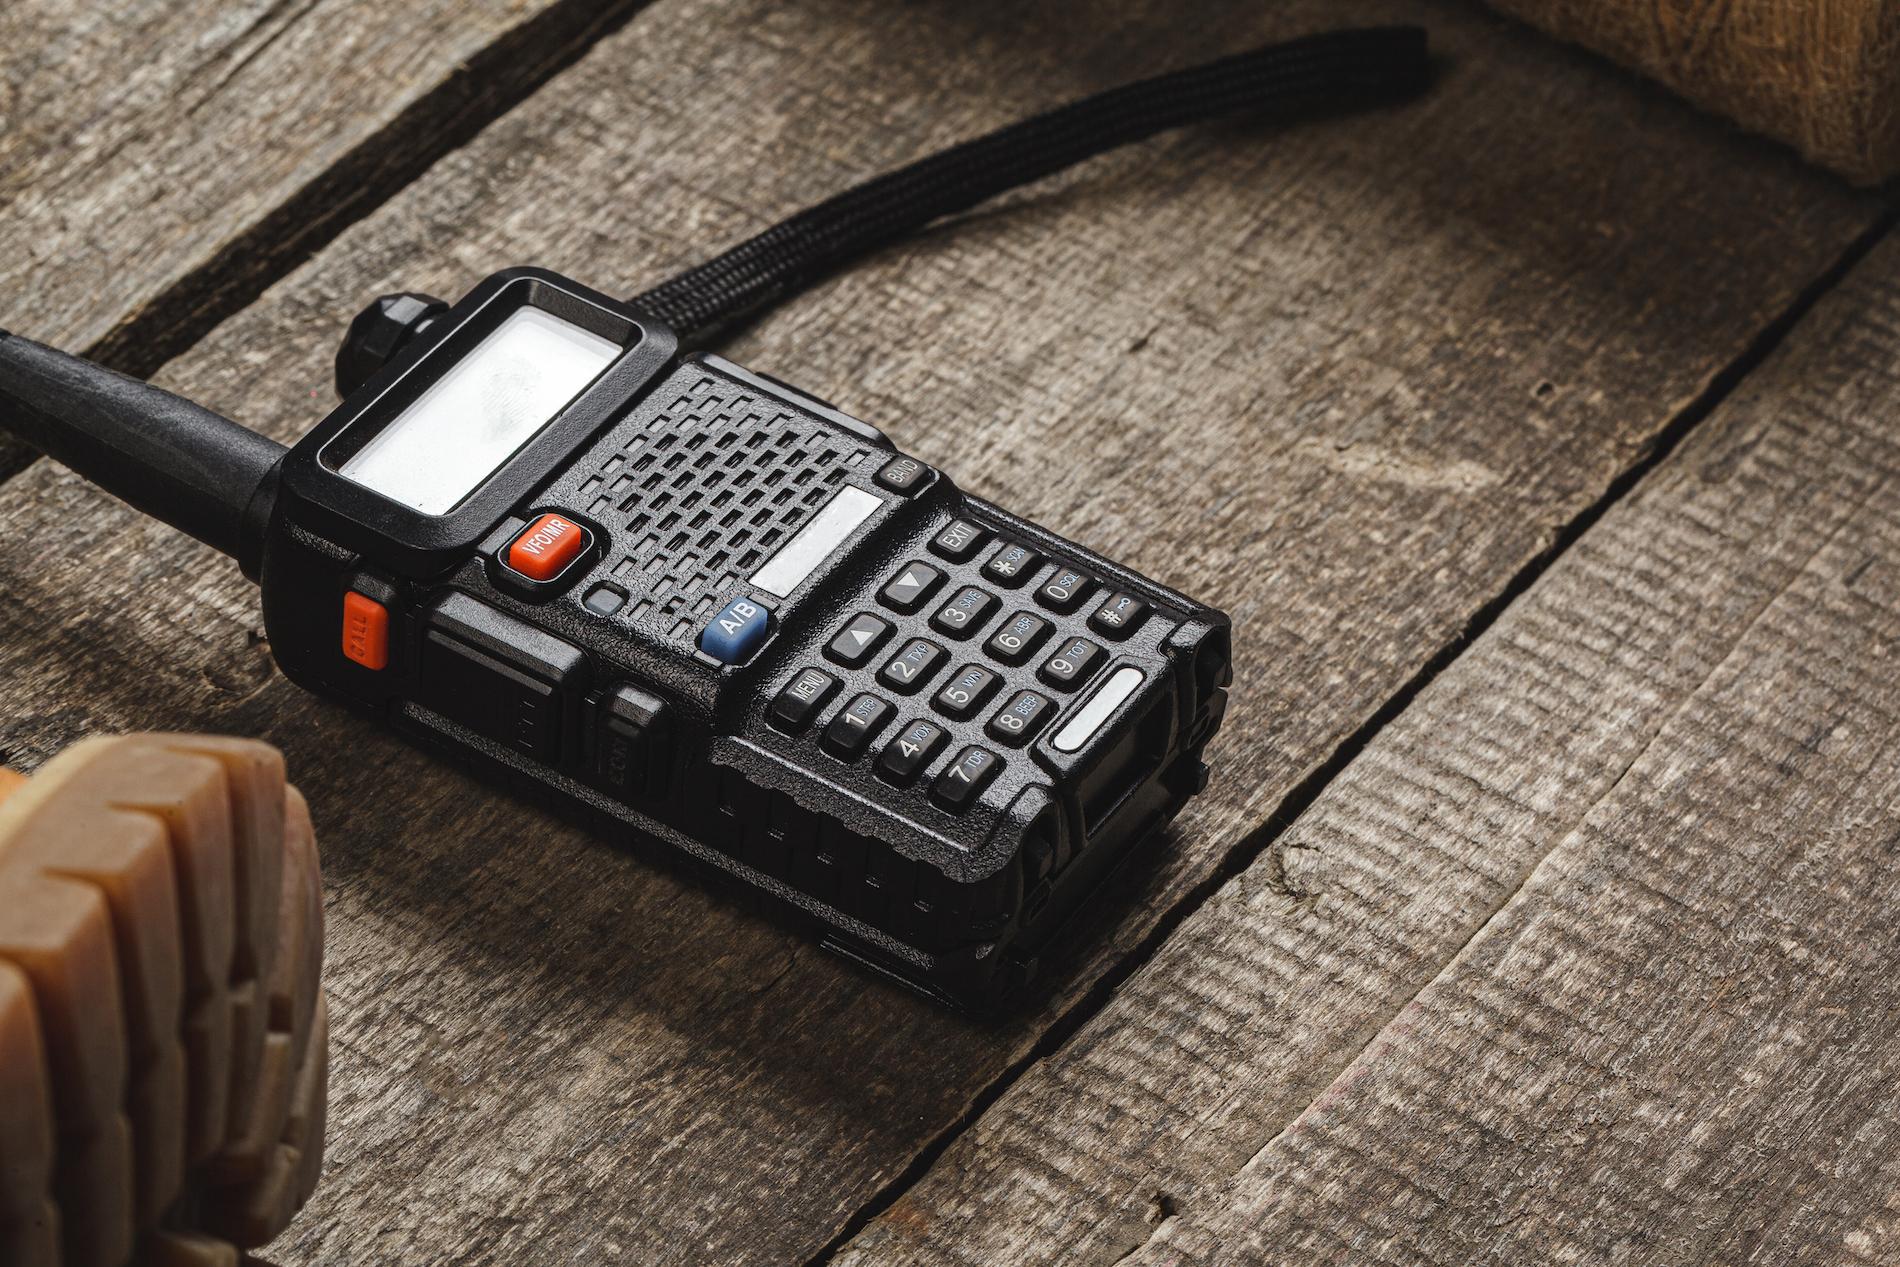 Walkie talkie radio set on wooden table close up